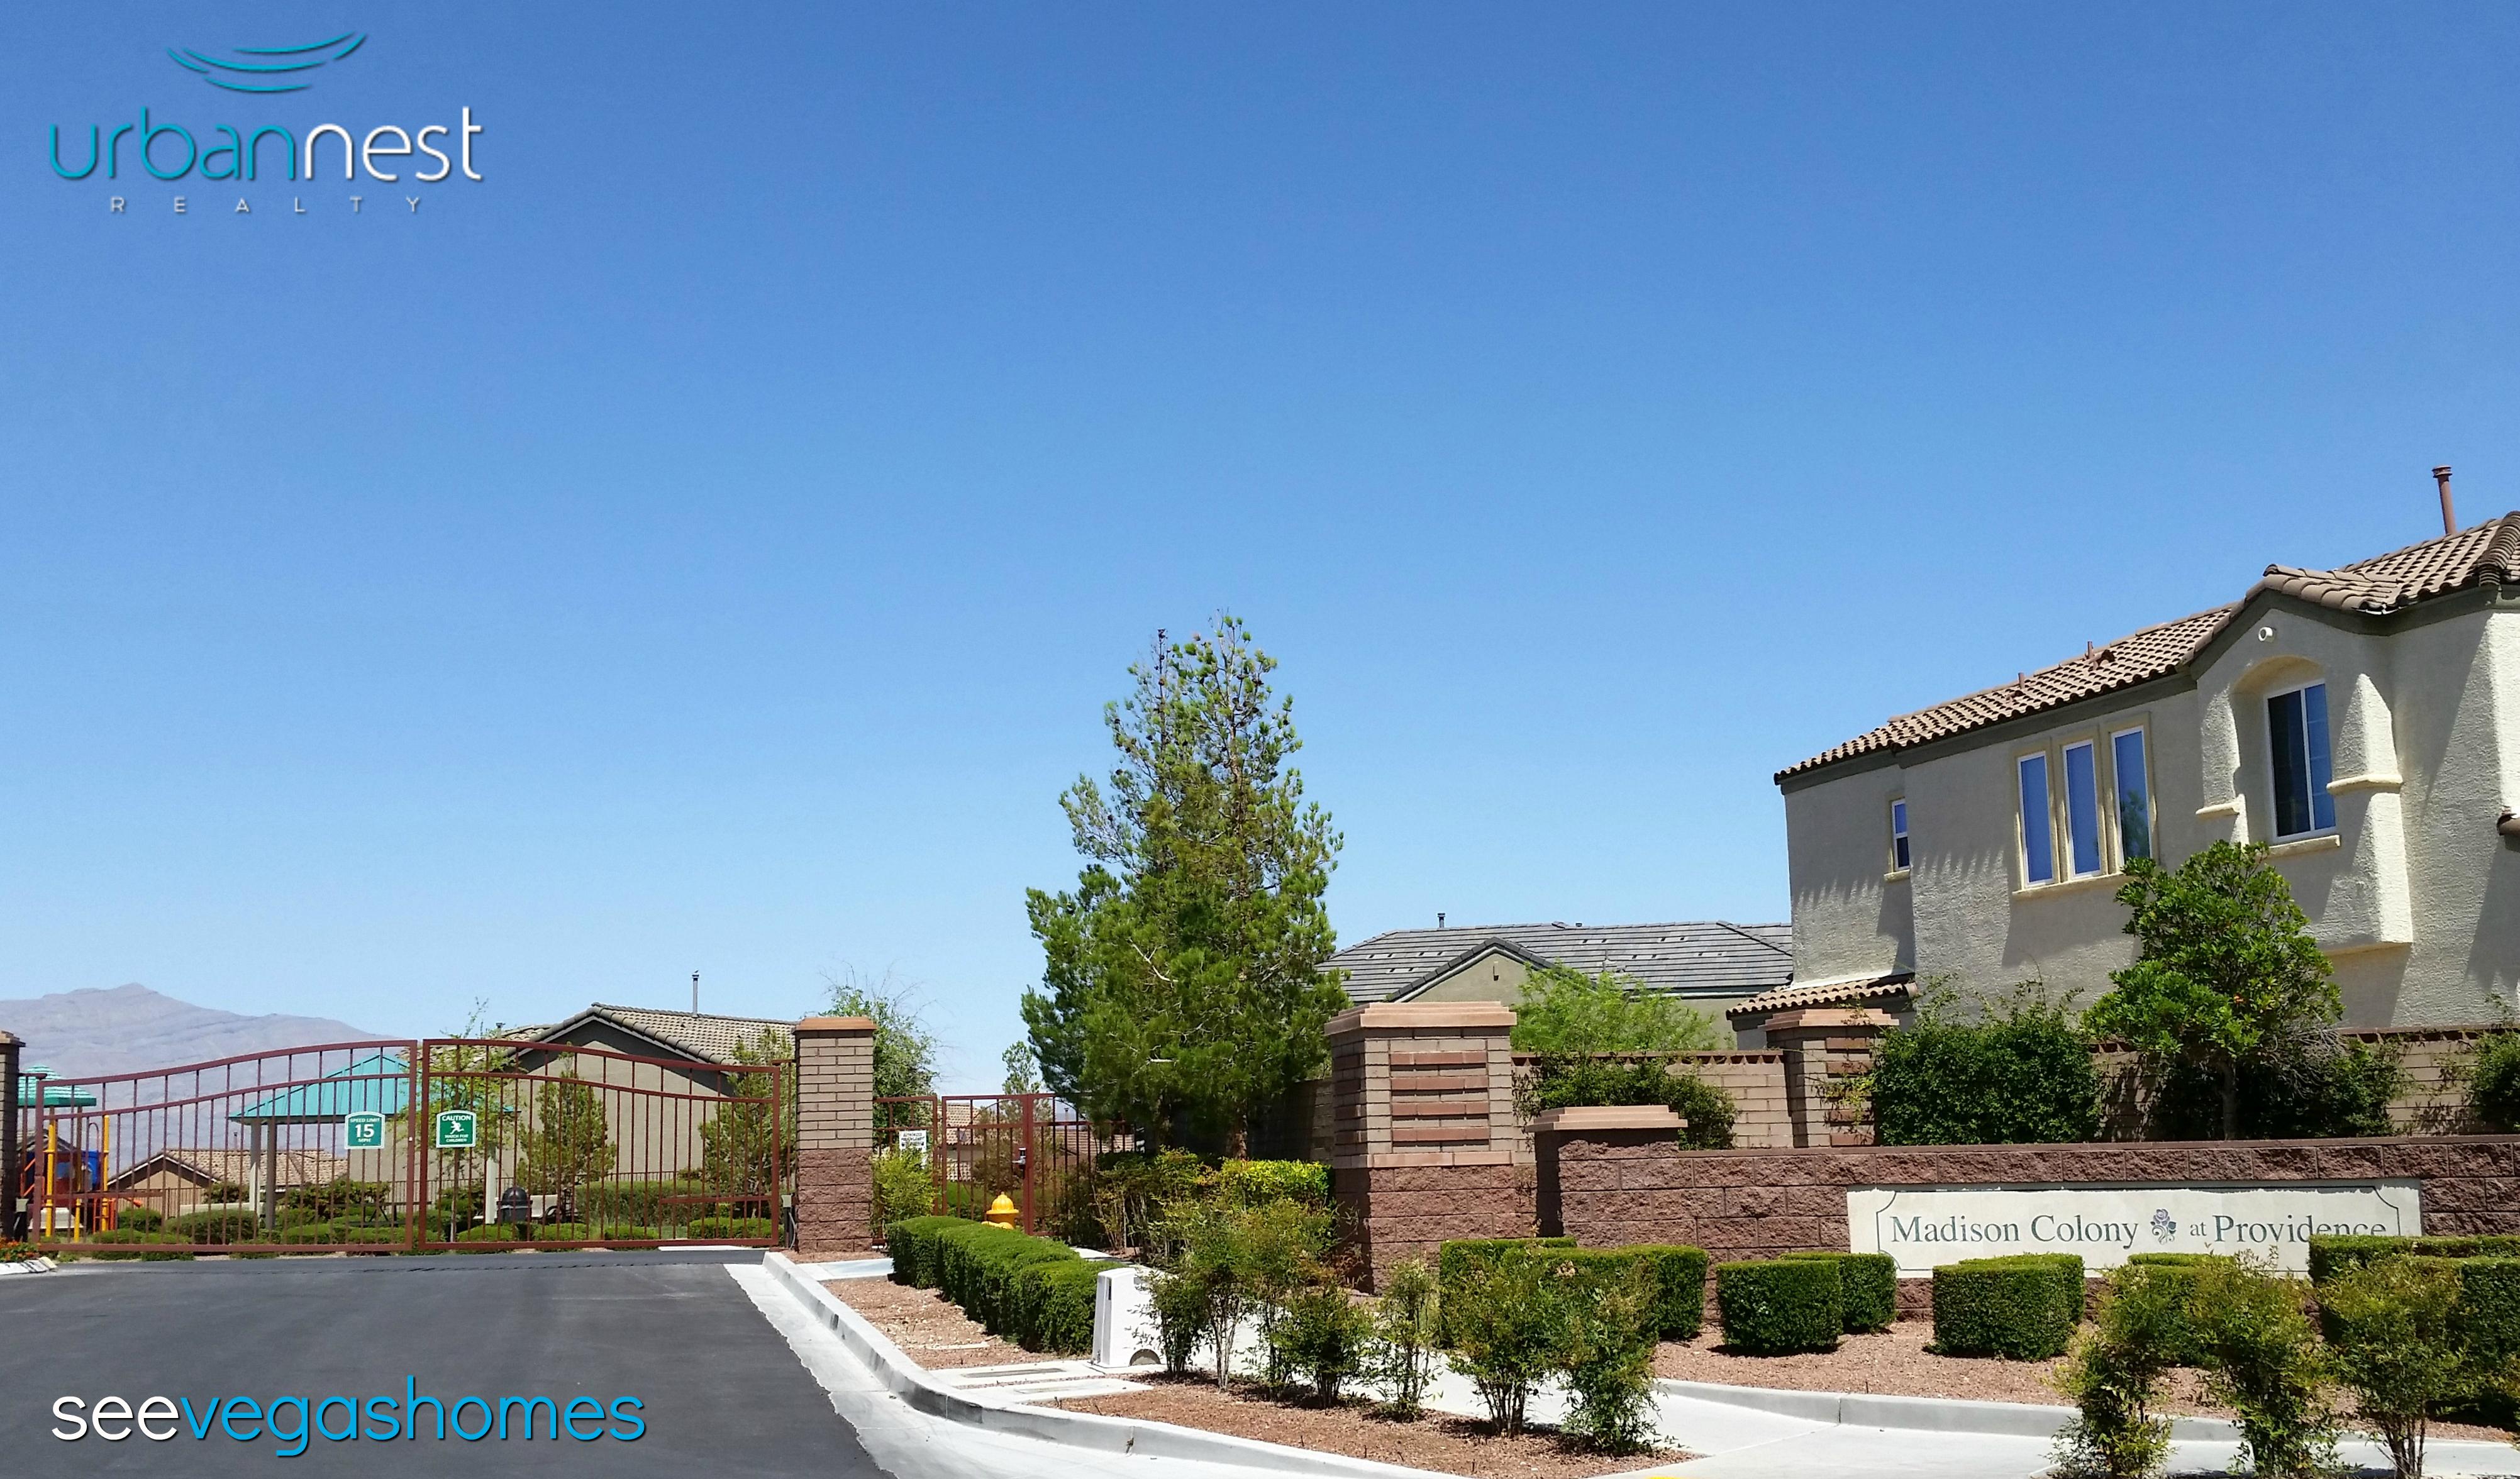 Madison Colony at Providence Las Vegas NV 89166 SeeVegasHomes